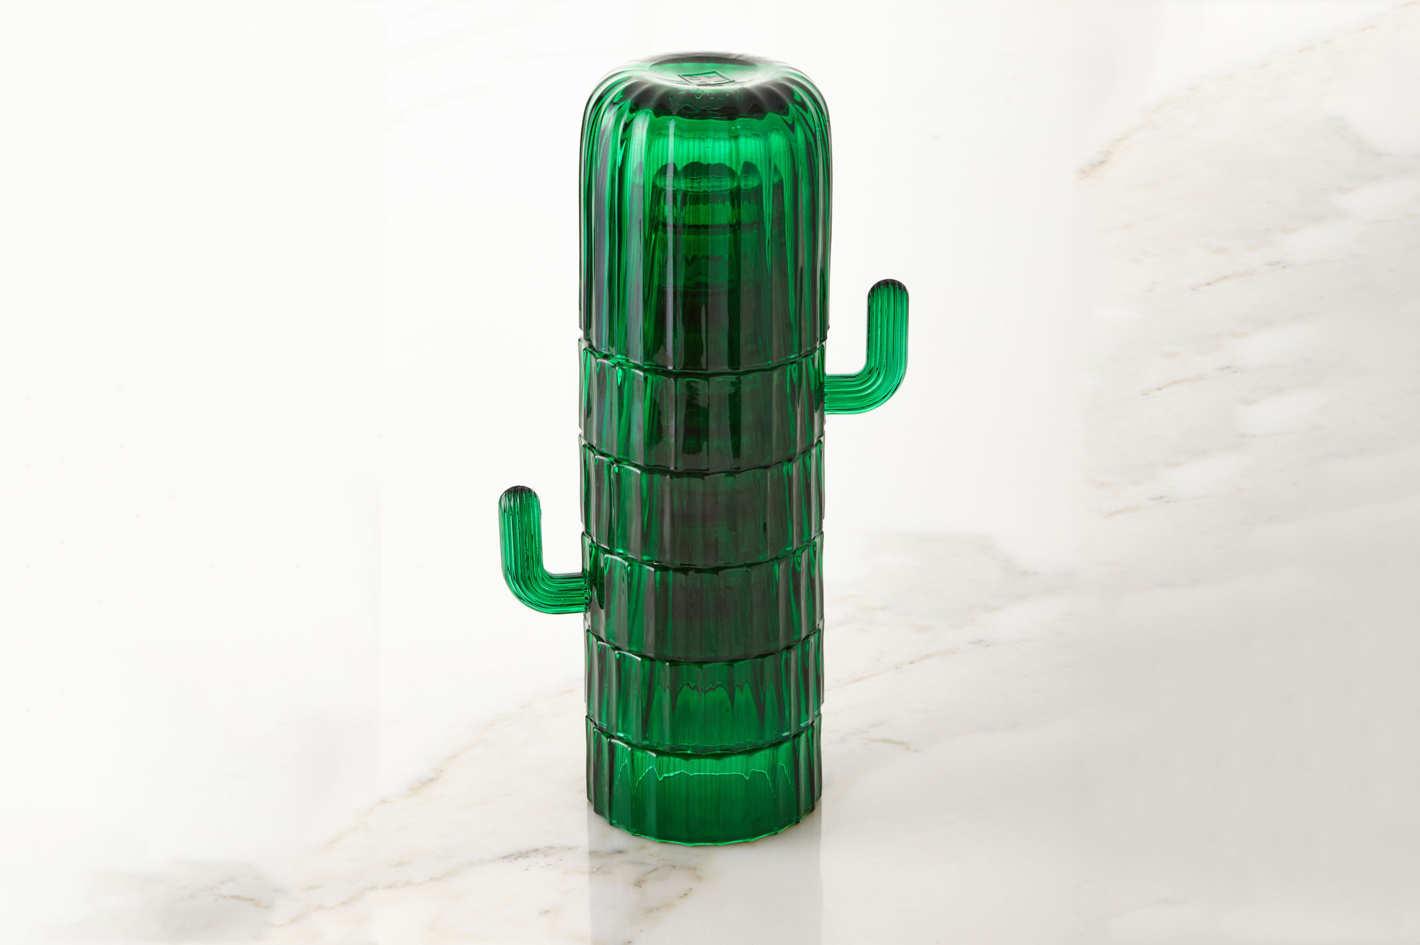 DOIY Saguaro Cactus Glasses